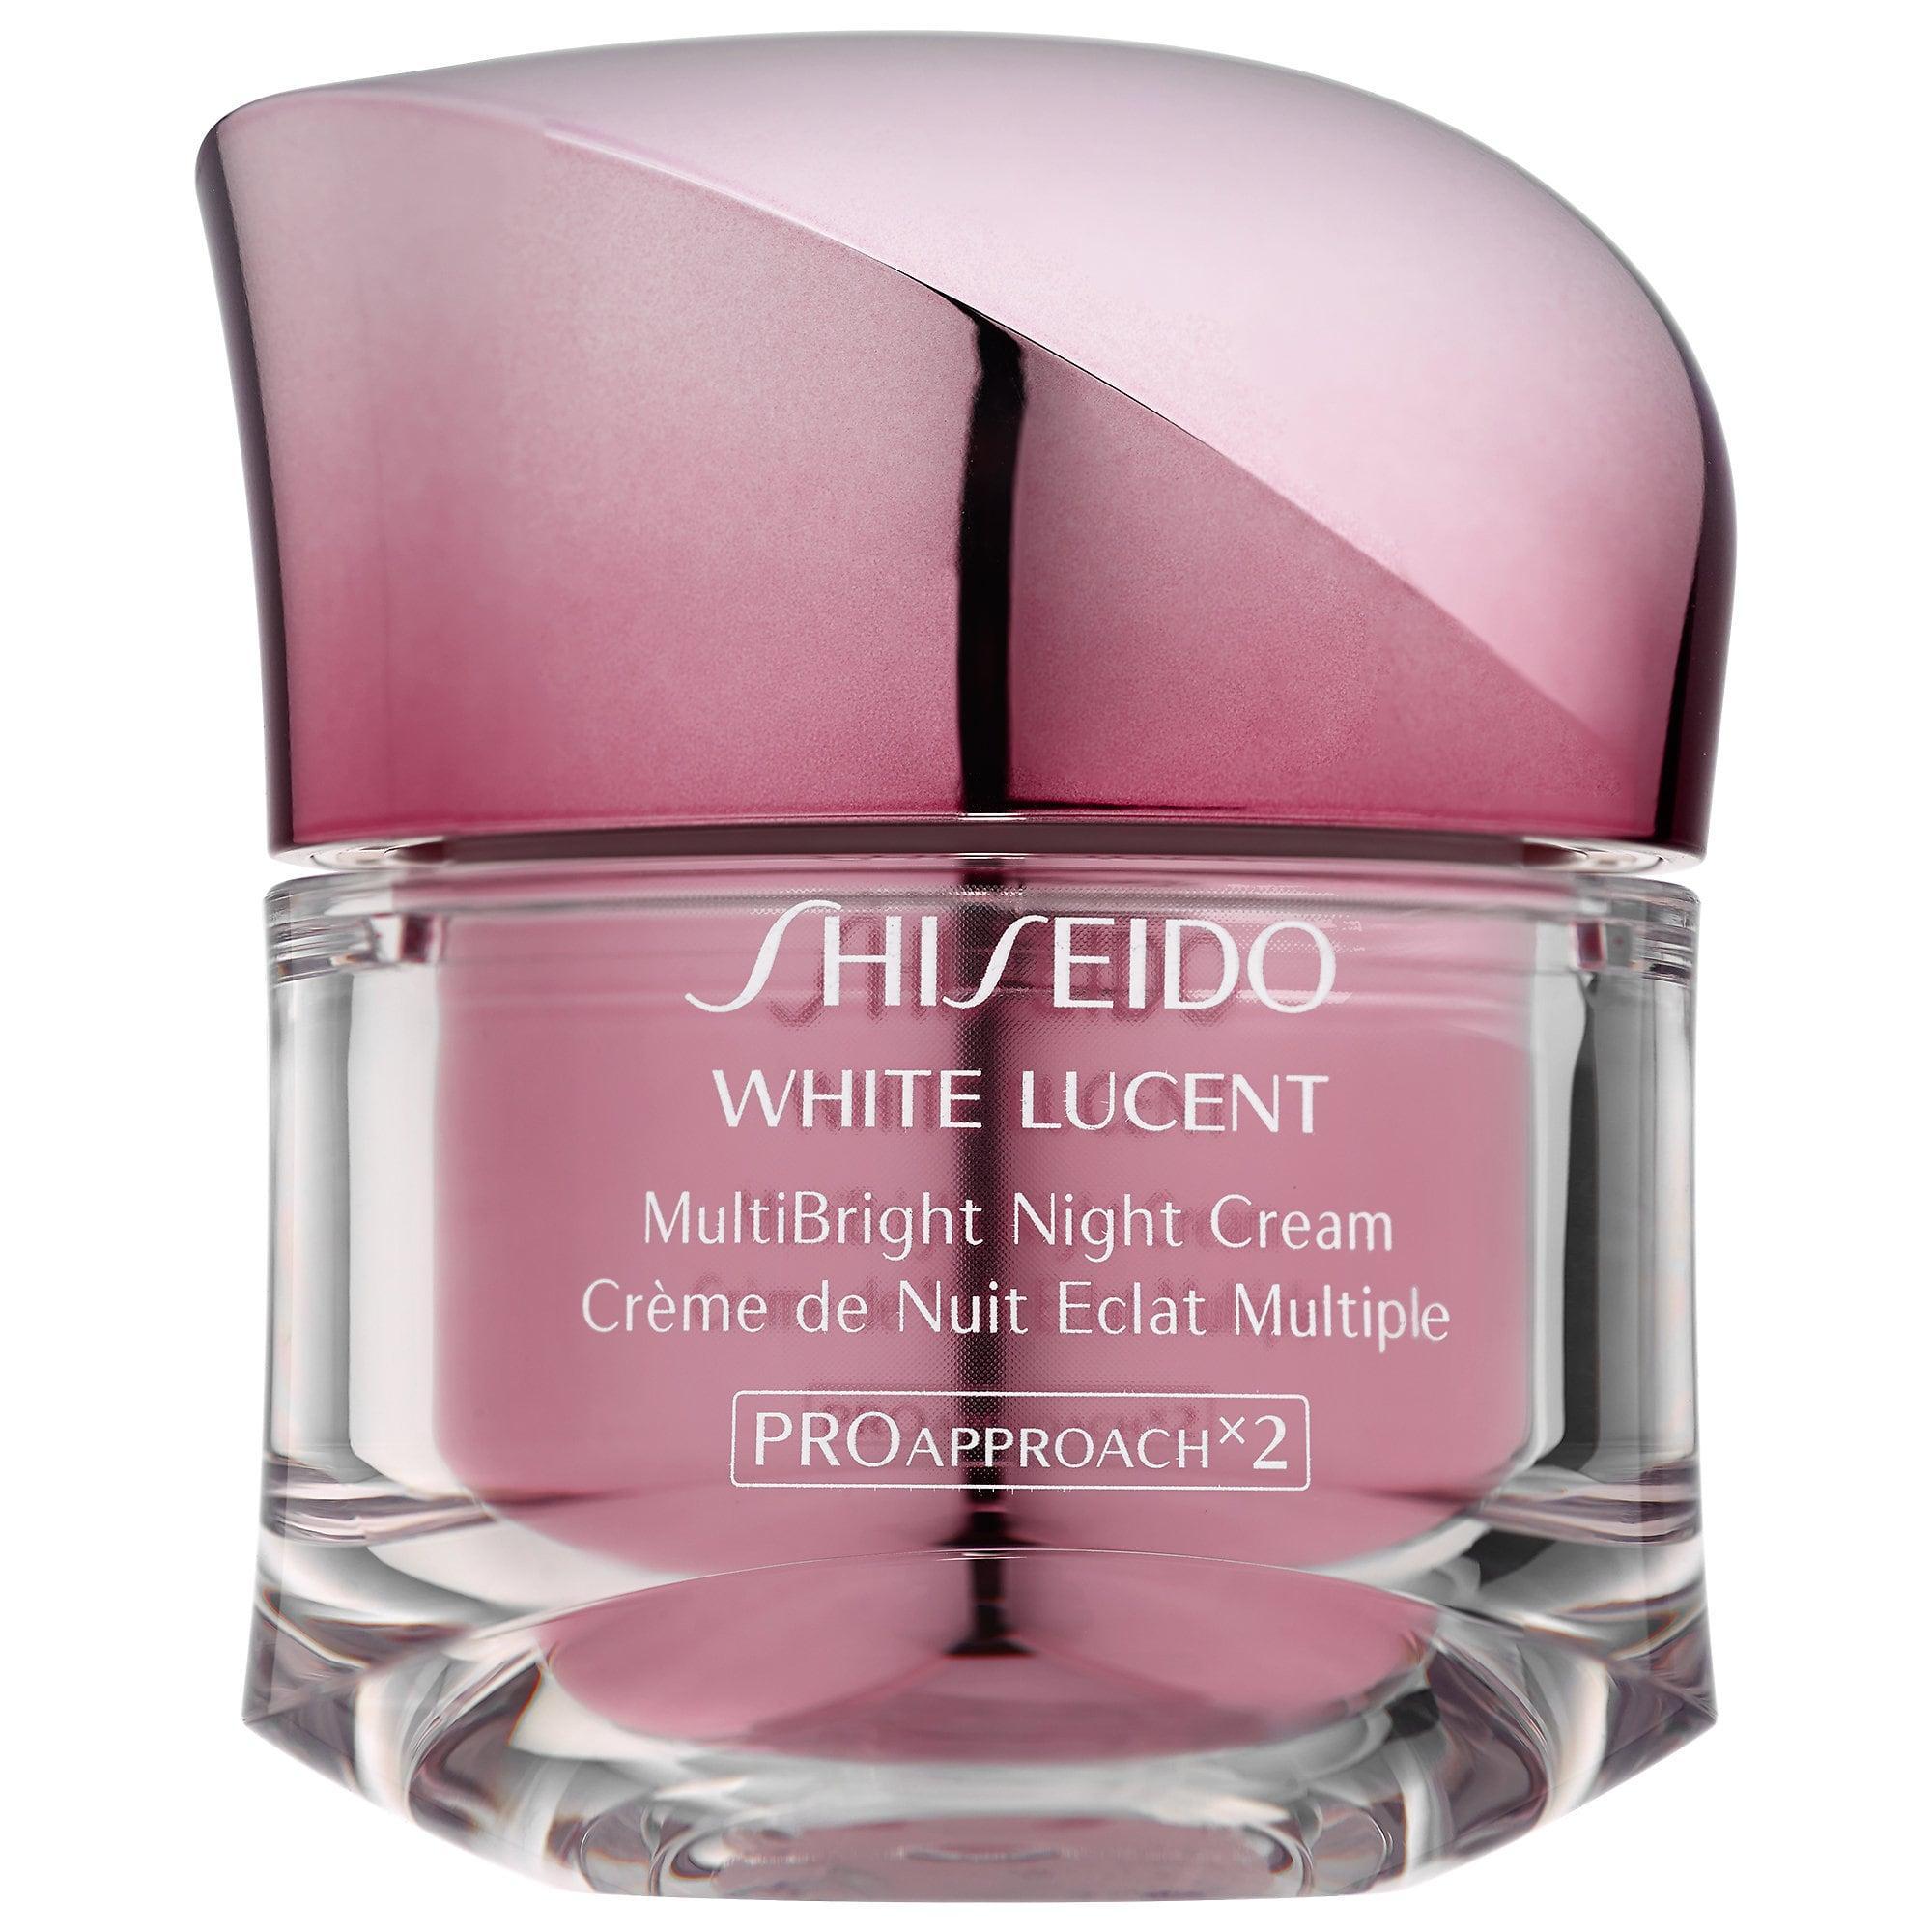 Buy Shiseido White Lucent Multibright Night Cream 50Ml Online